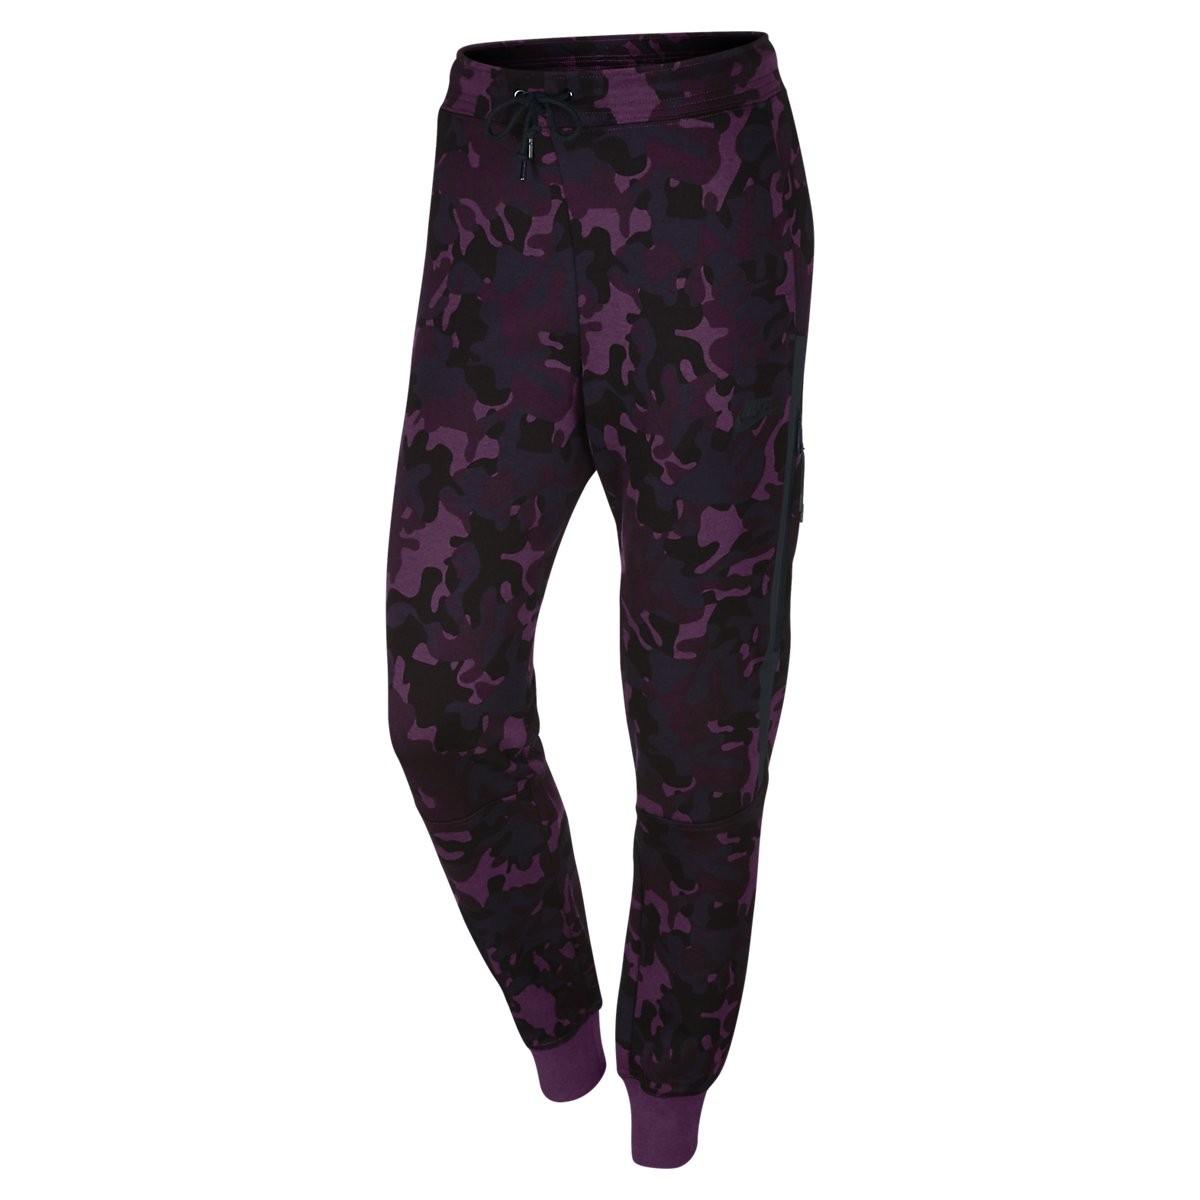 Pantalon de survêtement Nike Tech Fleece Camo DownTownStock.Com